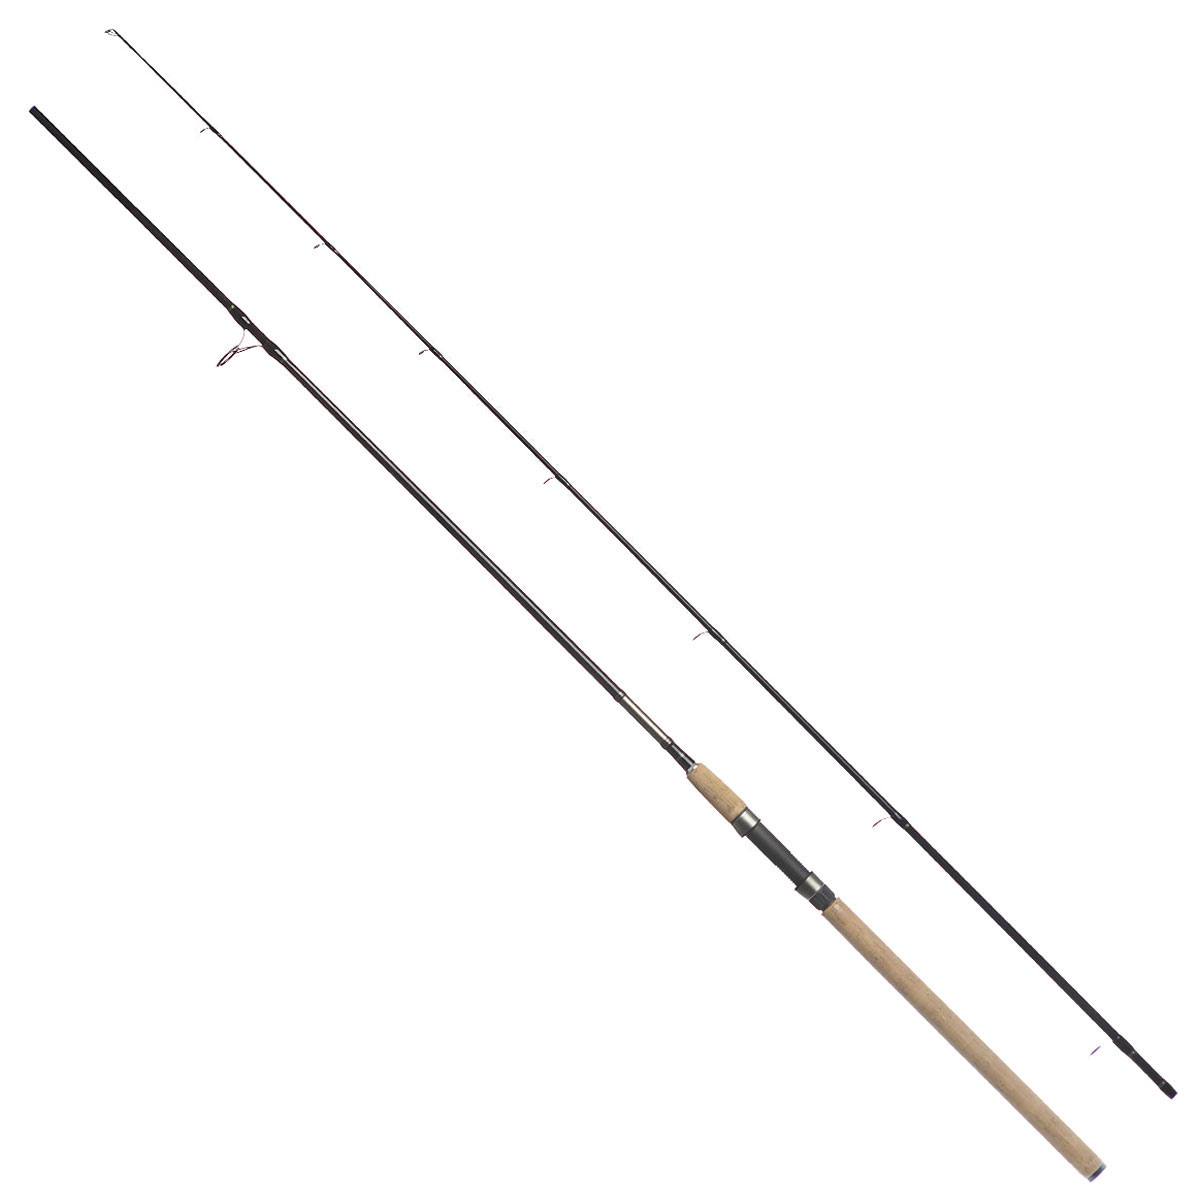 Спиннинг штекерный Daiwa Exceler-AR New, 2,59 м, 10-40 г спиннинг штекерный salmo taifun 40 2 1 м 10 40 г